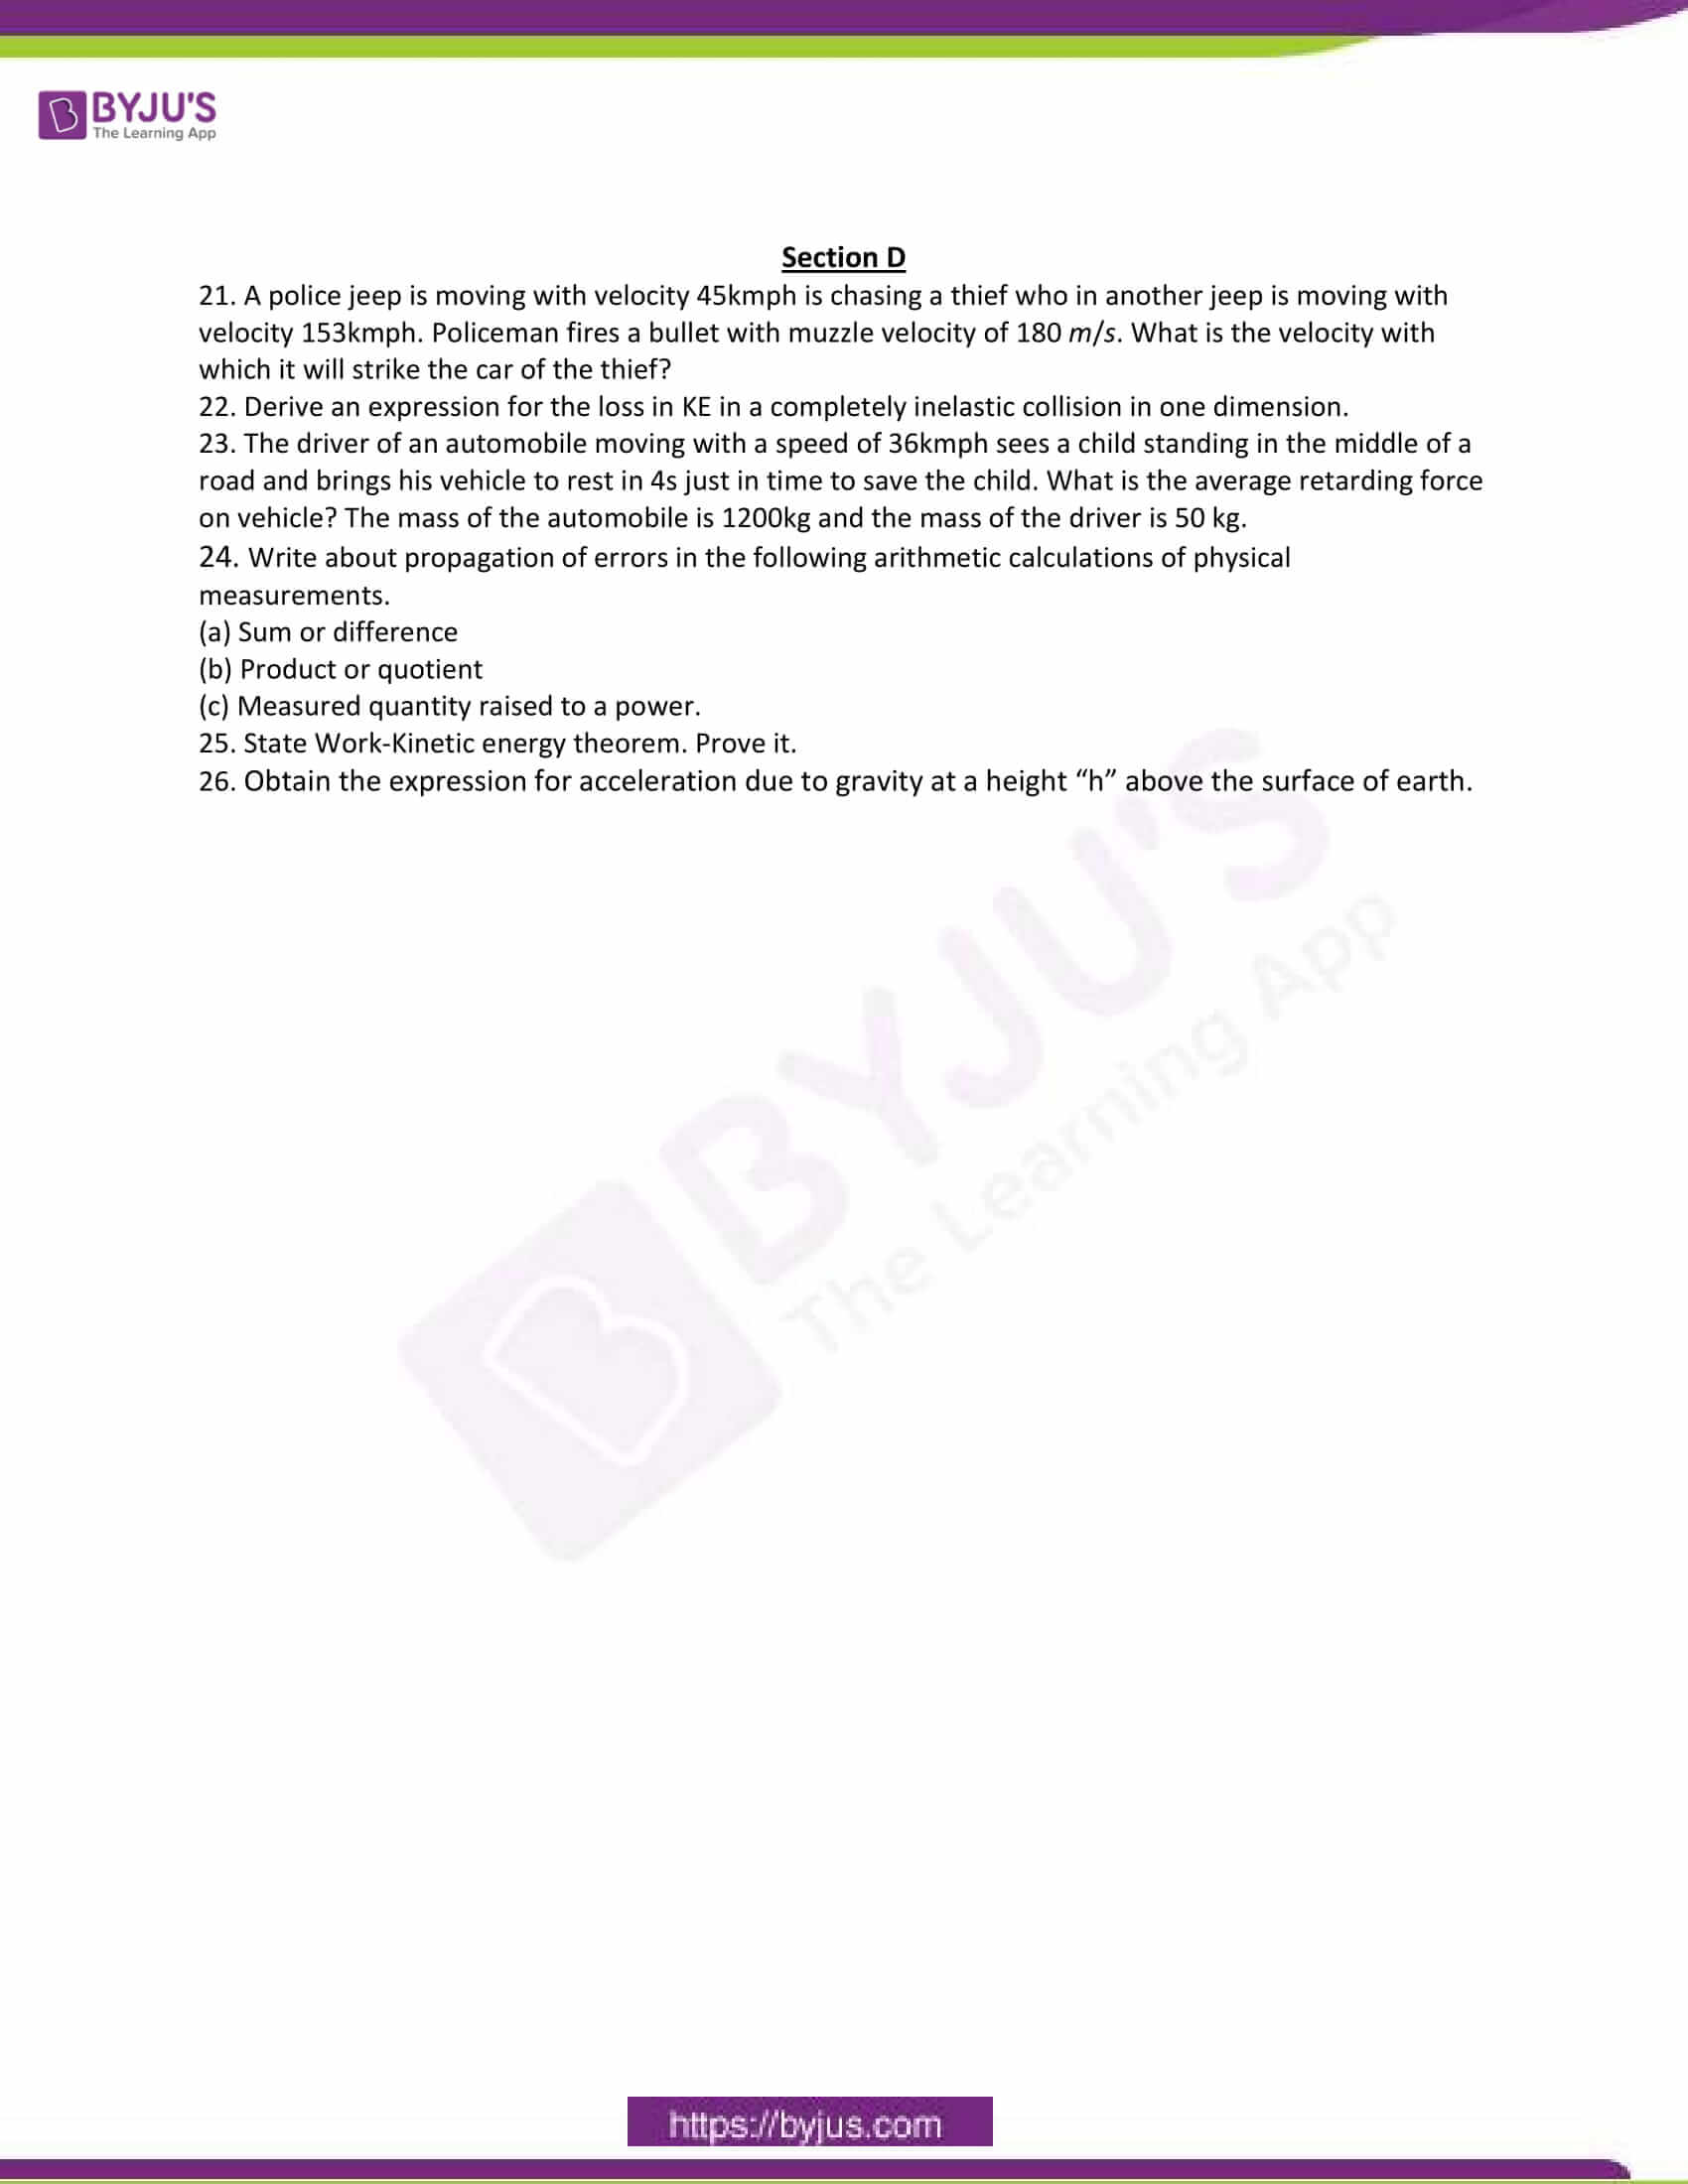 cbse class 11 phy sample paper set 6